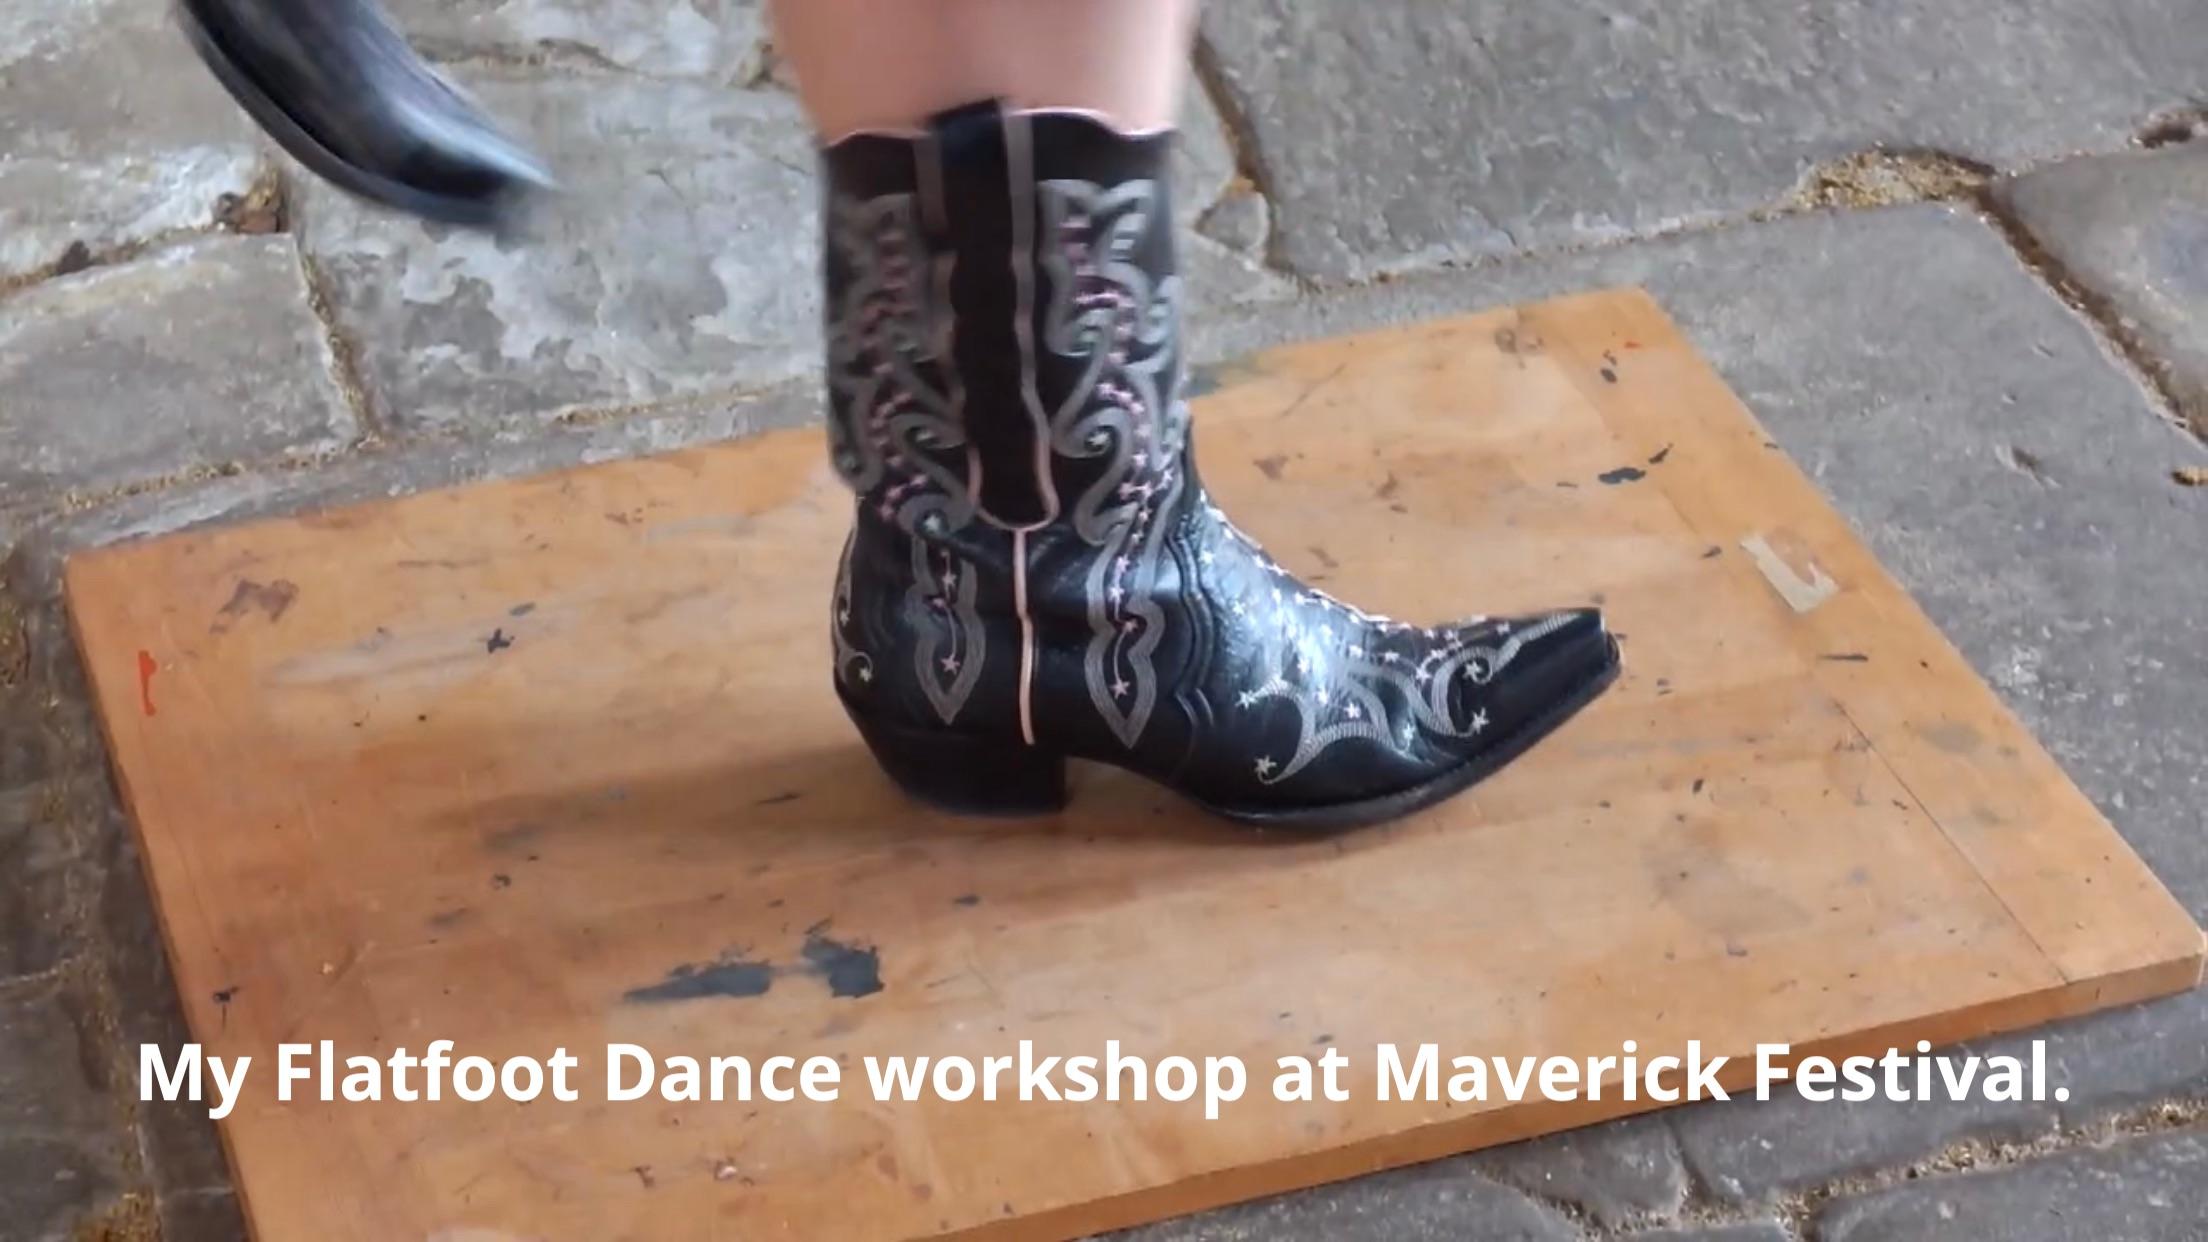 Jeni's feet in cowboy boots